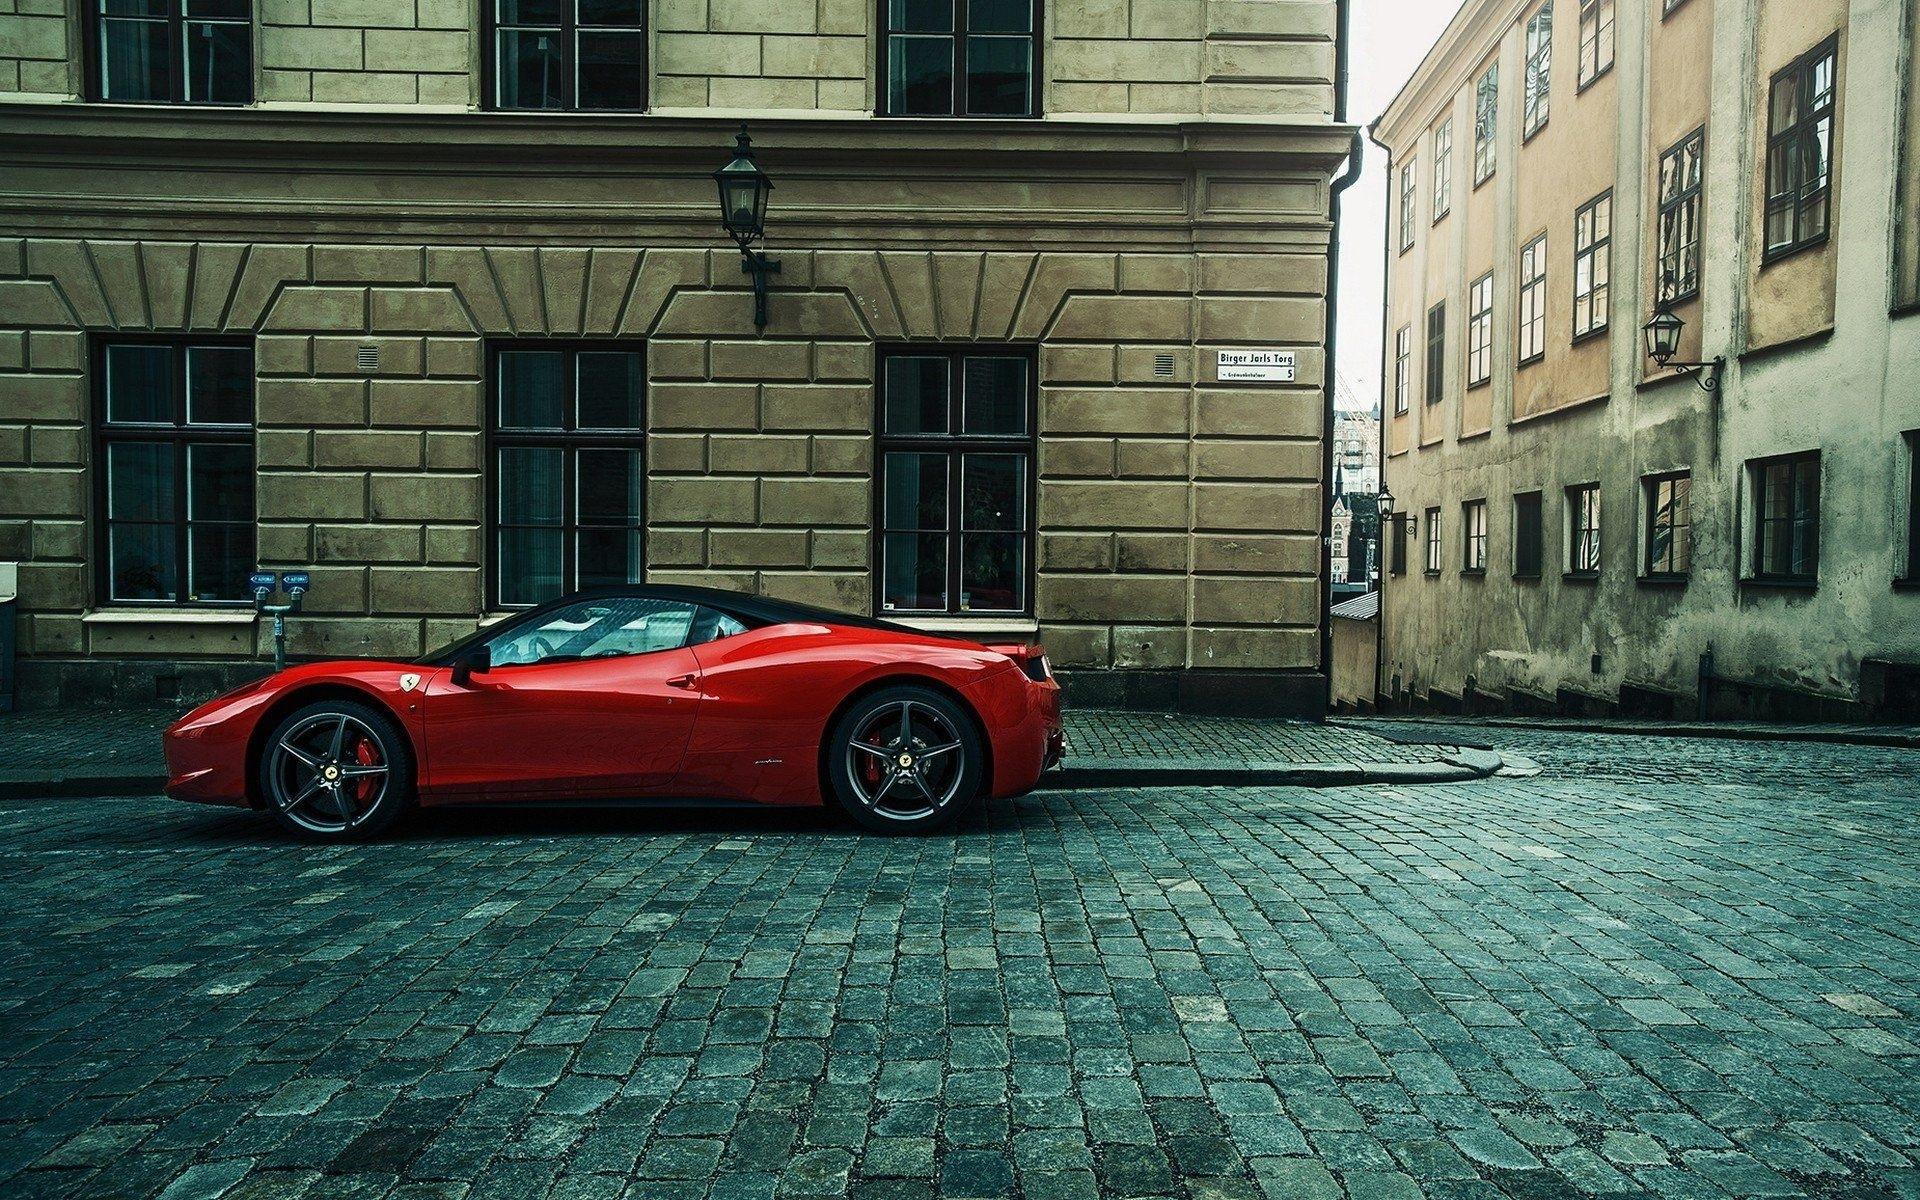 1920x1200 Px Building Car Cobblestone Ferrari 458 Italia Street Urban